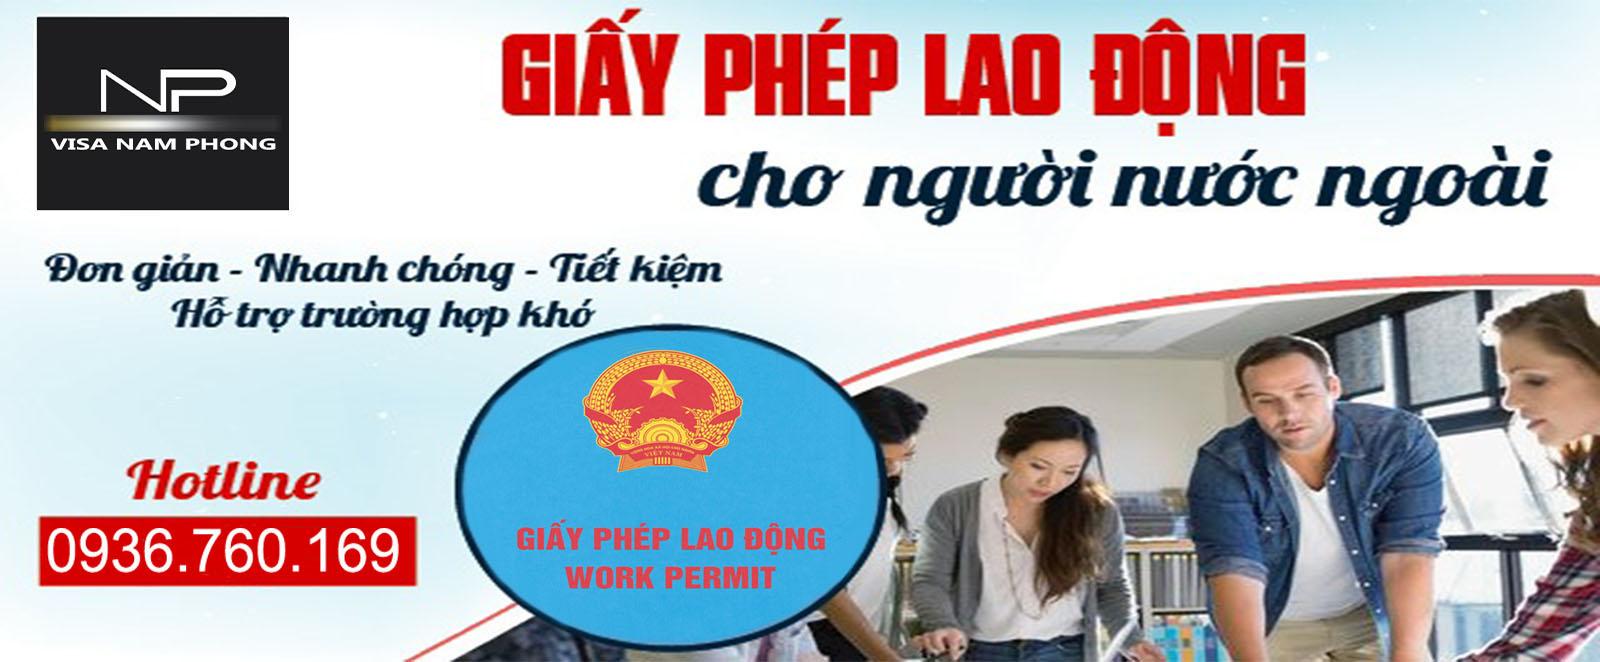 giay phep lao dong tai hai phong